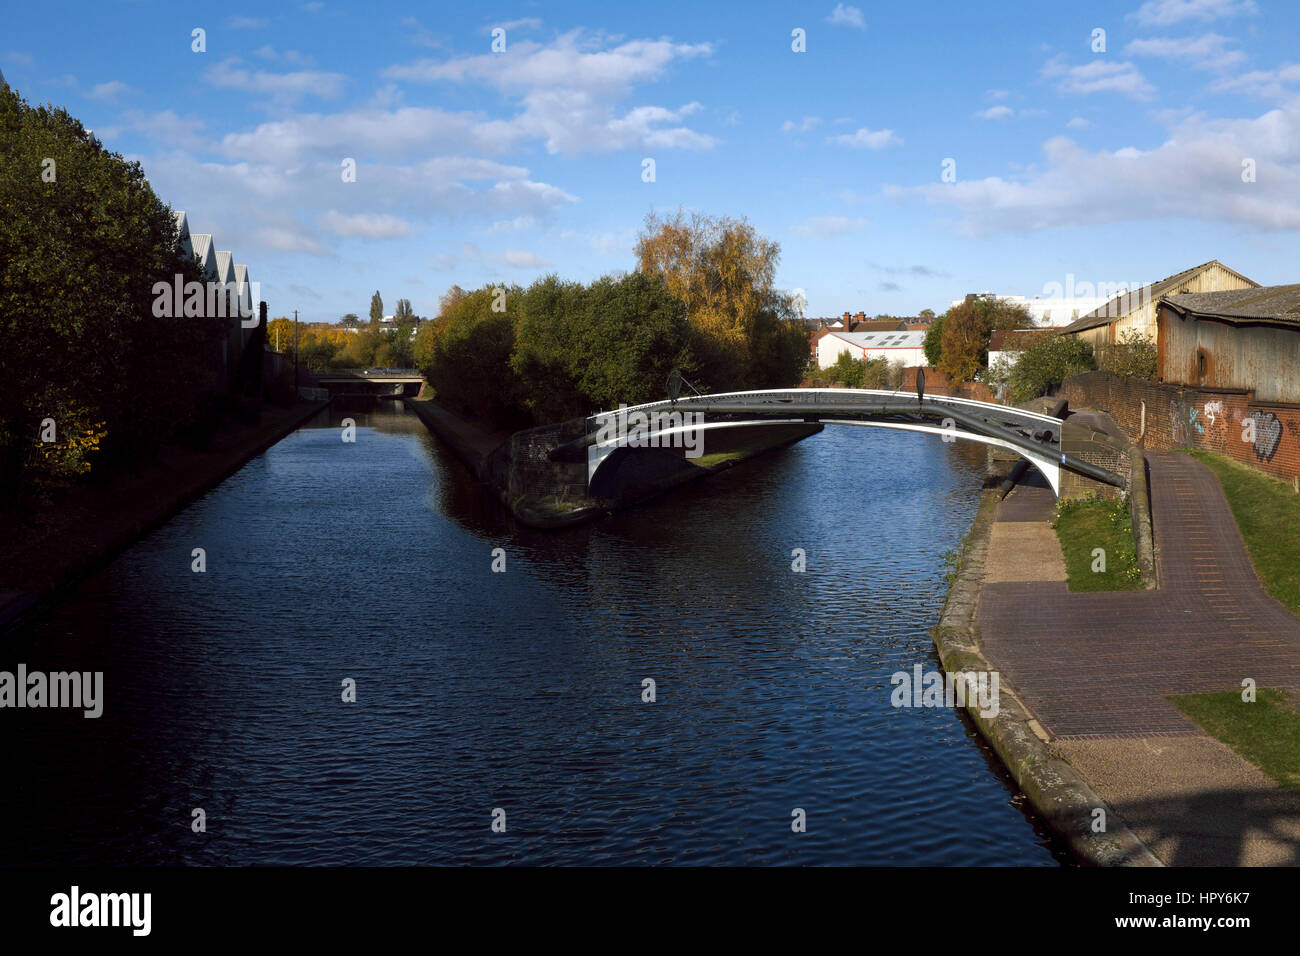 Smethwick Junction, Birmingham Canal Navigations, Smethwick, West Midlands, England, UK - Stock Image